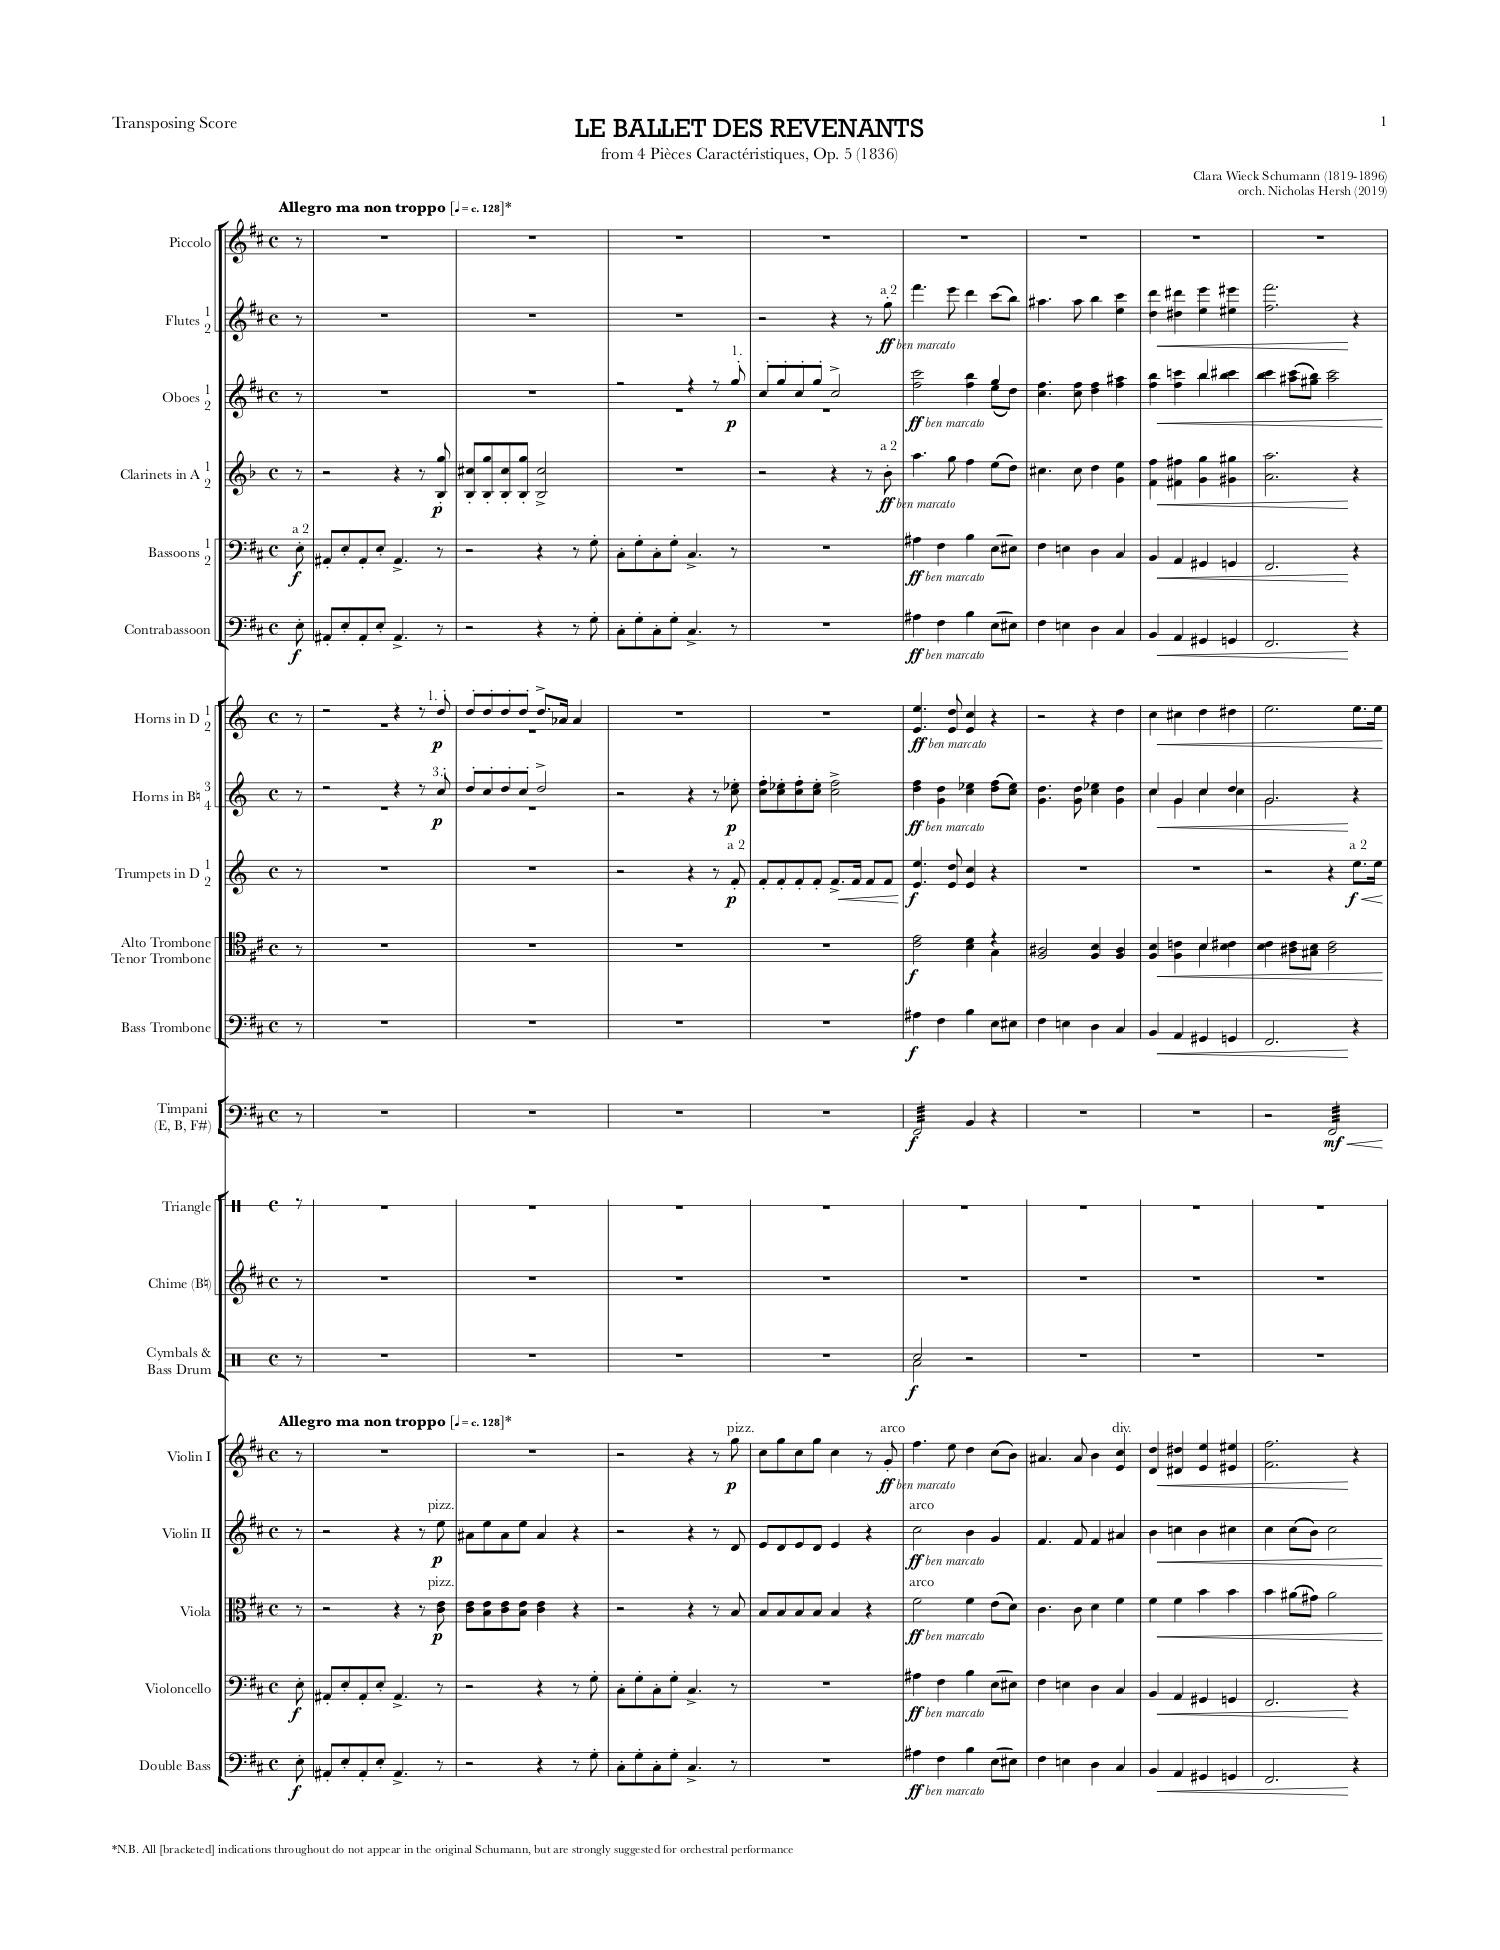 BdR - 00 Transposing Score.jpg